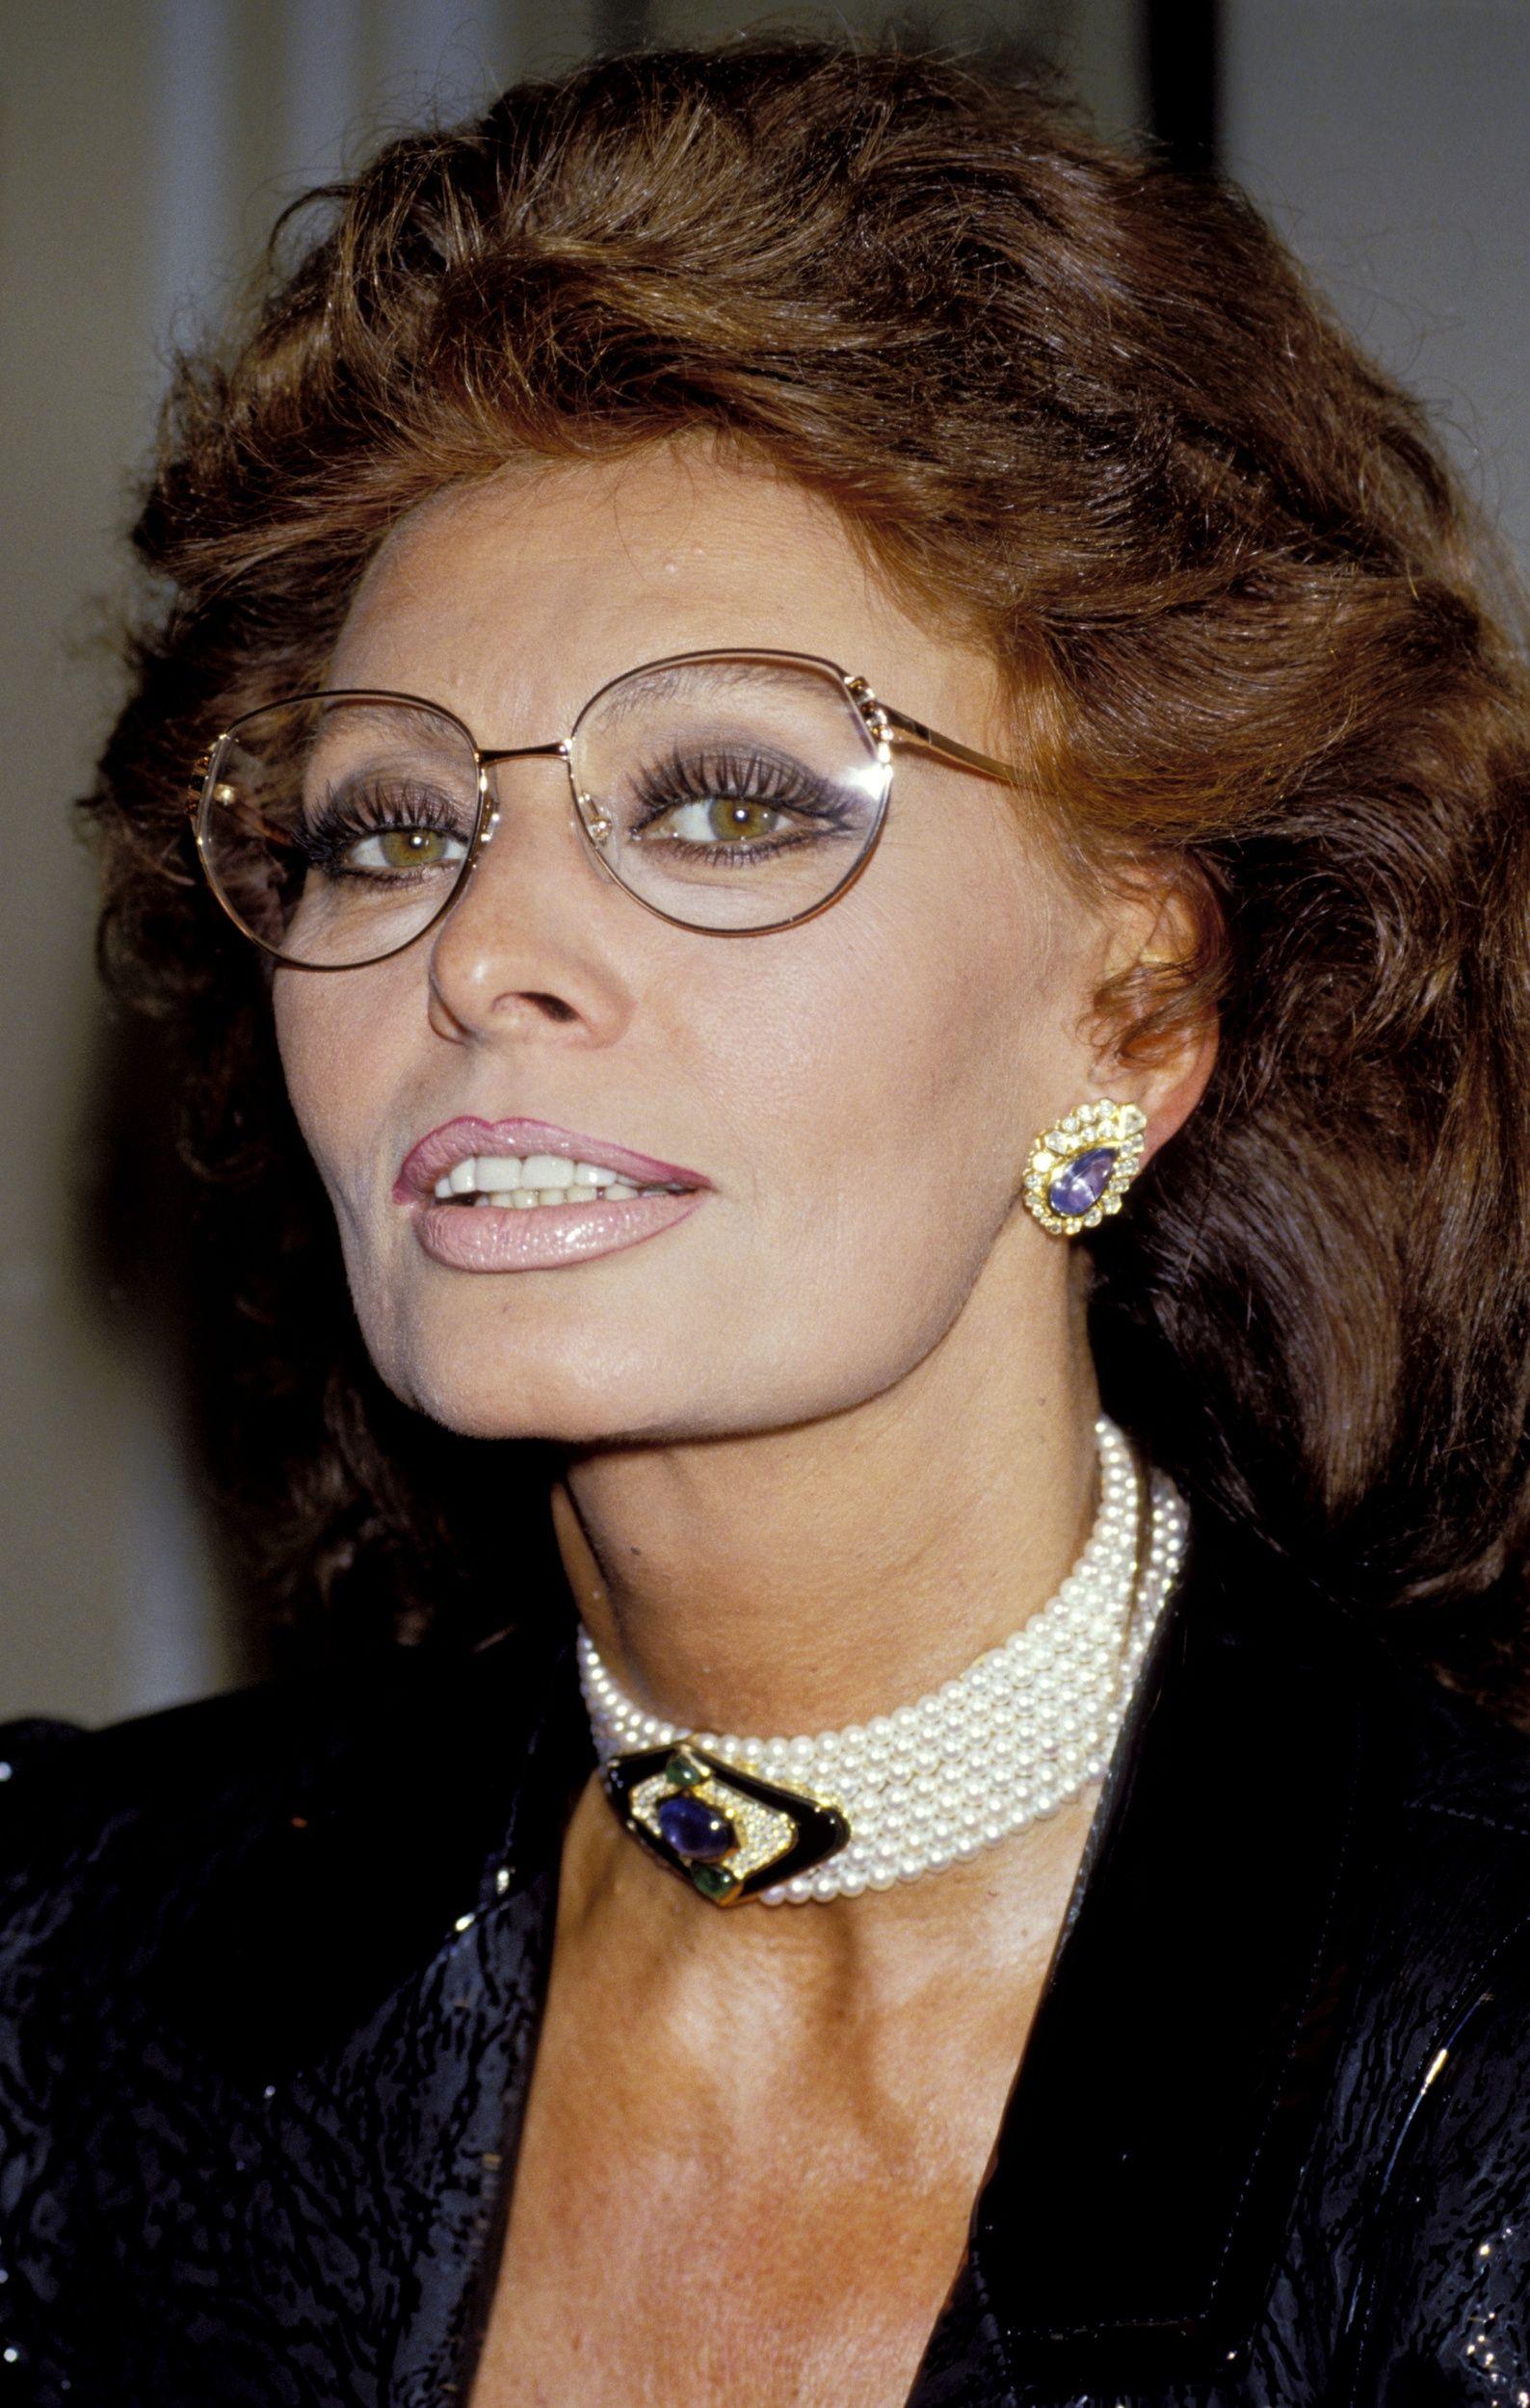 Sophia Loren Then And Now Sophia Loren Sophia Loren Makeup Sophia Loren Style